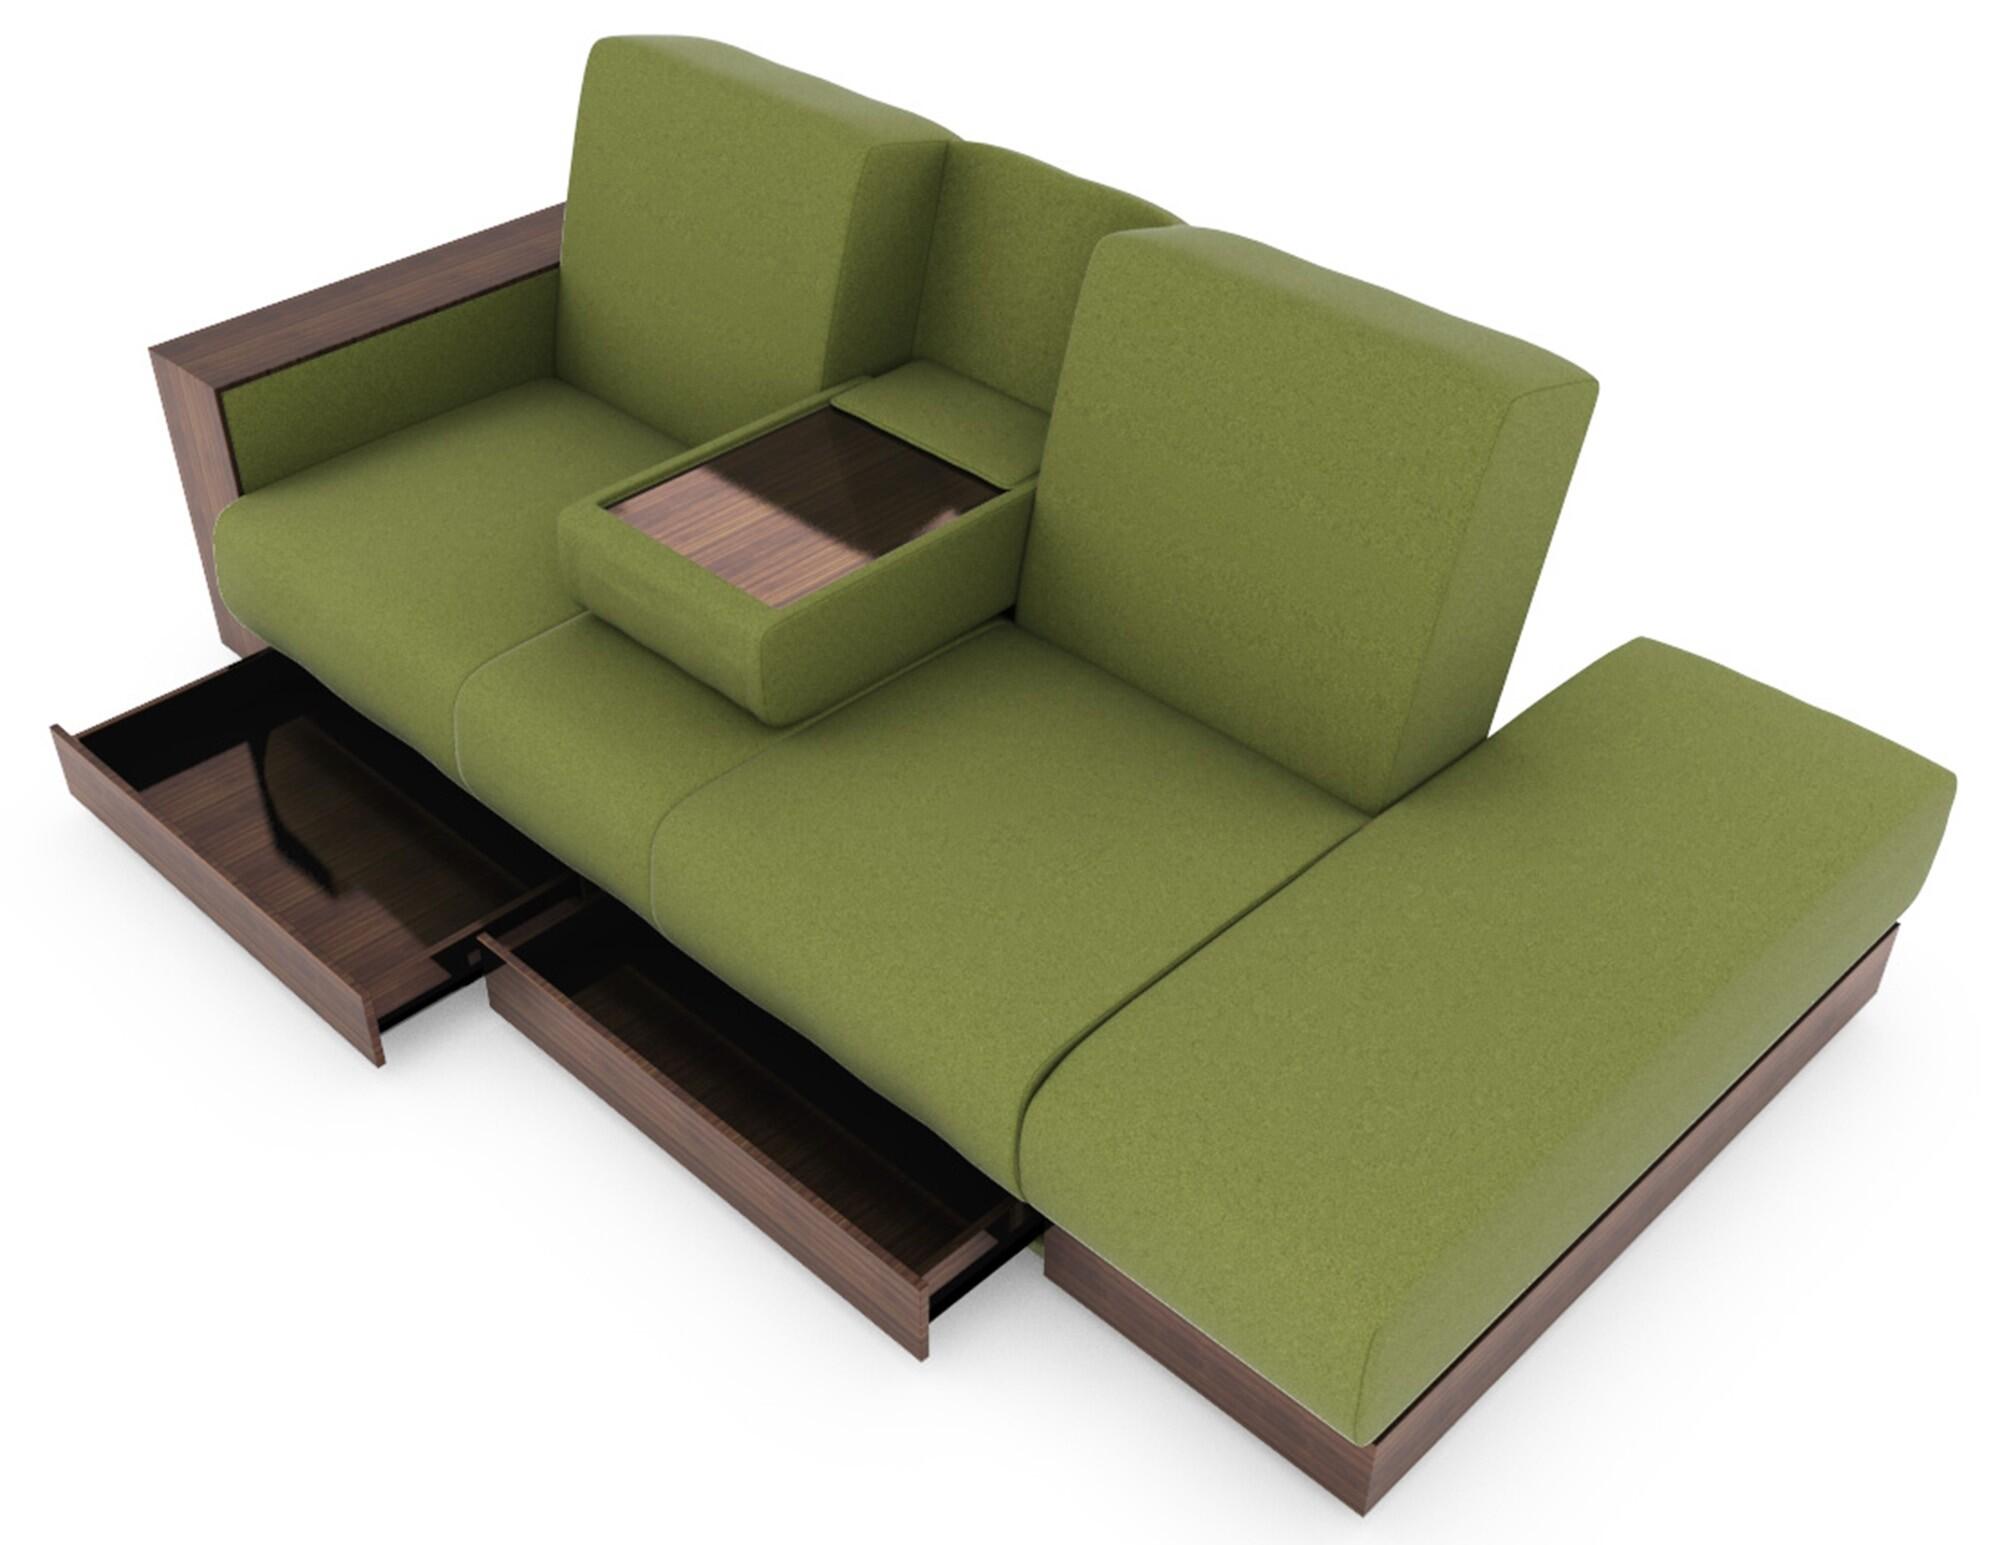 Sarai Storage Sofa Bed in Fabric Furniture & Home Décor